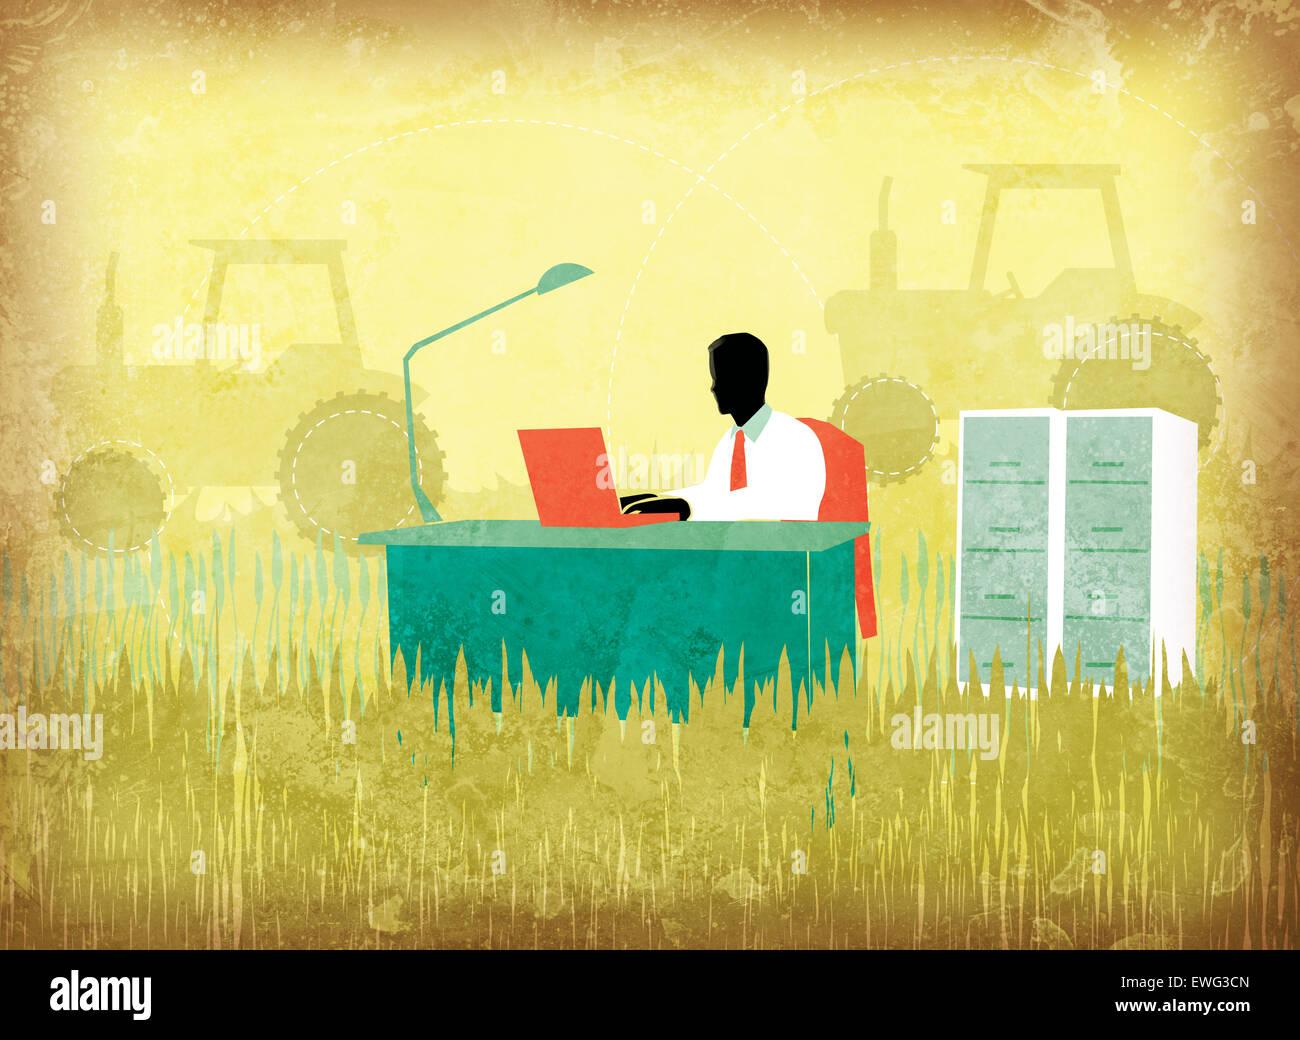 Illustration libre de businessman using laptop on agricultural field Photo Stock